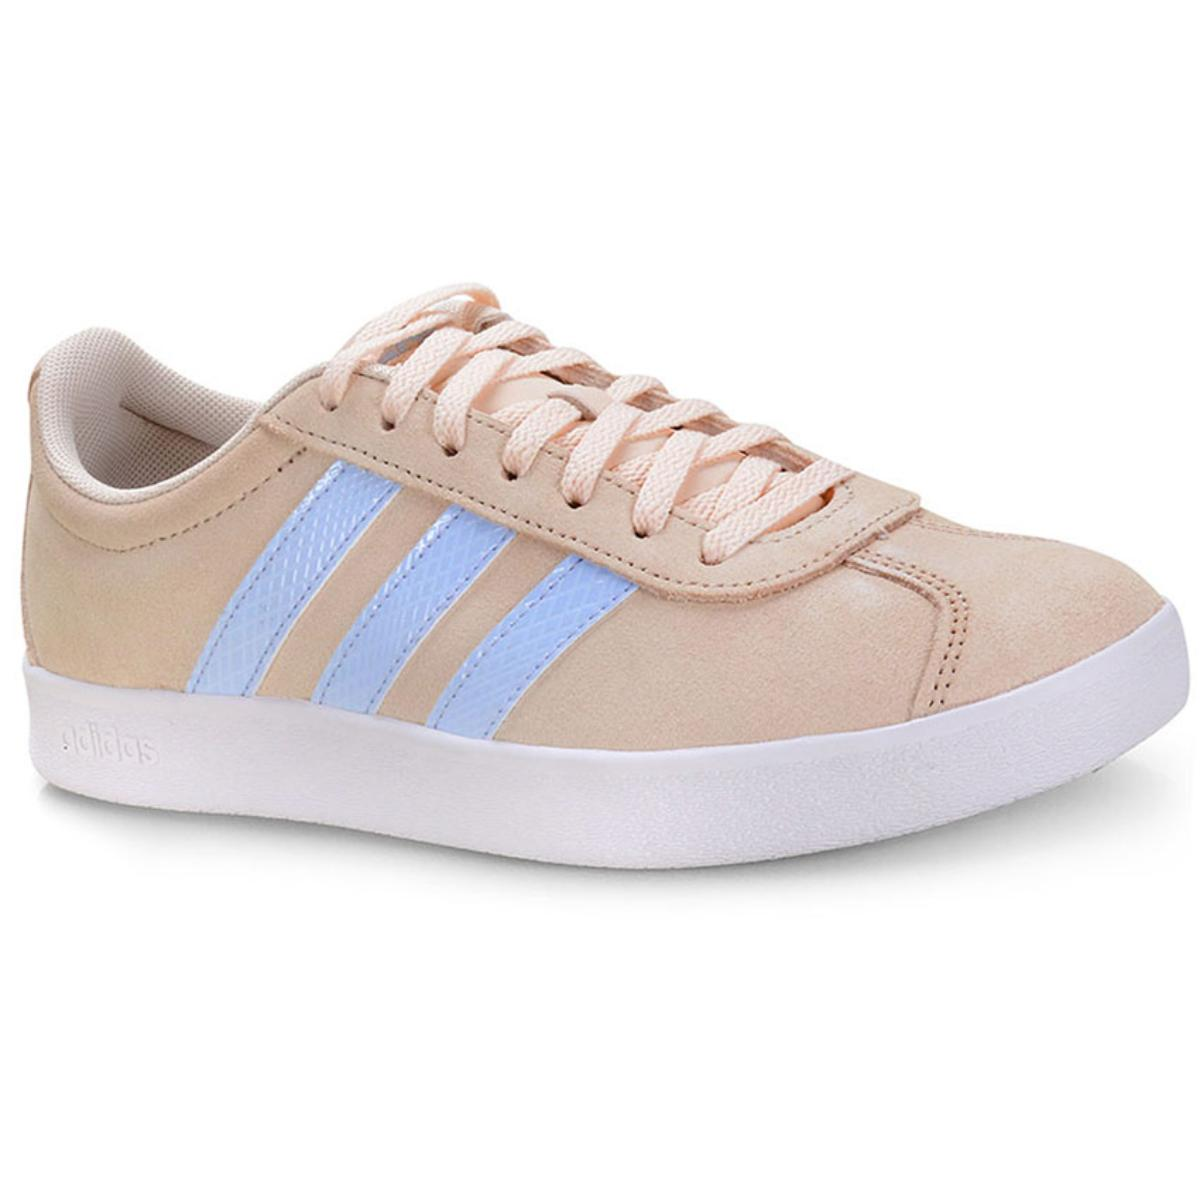 Tênis Feminino Adidas Ee6787 vl Court 20 w Bege/azul